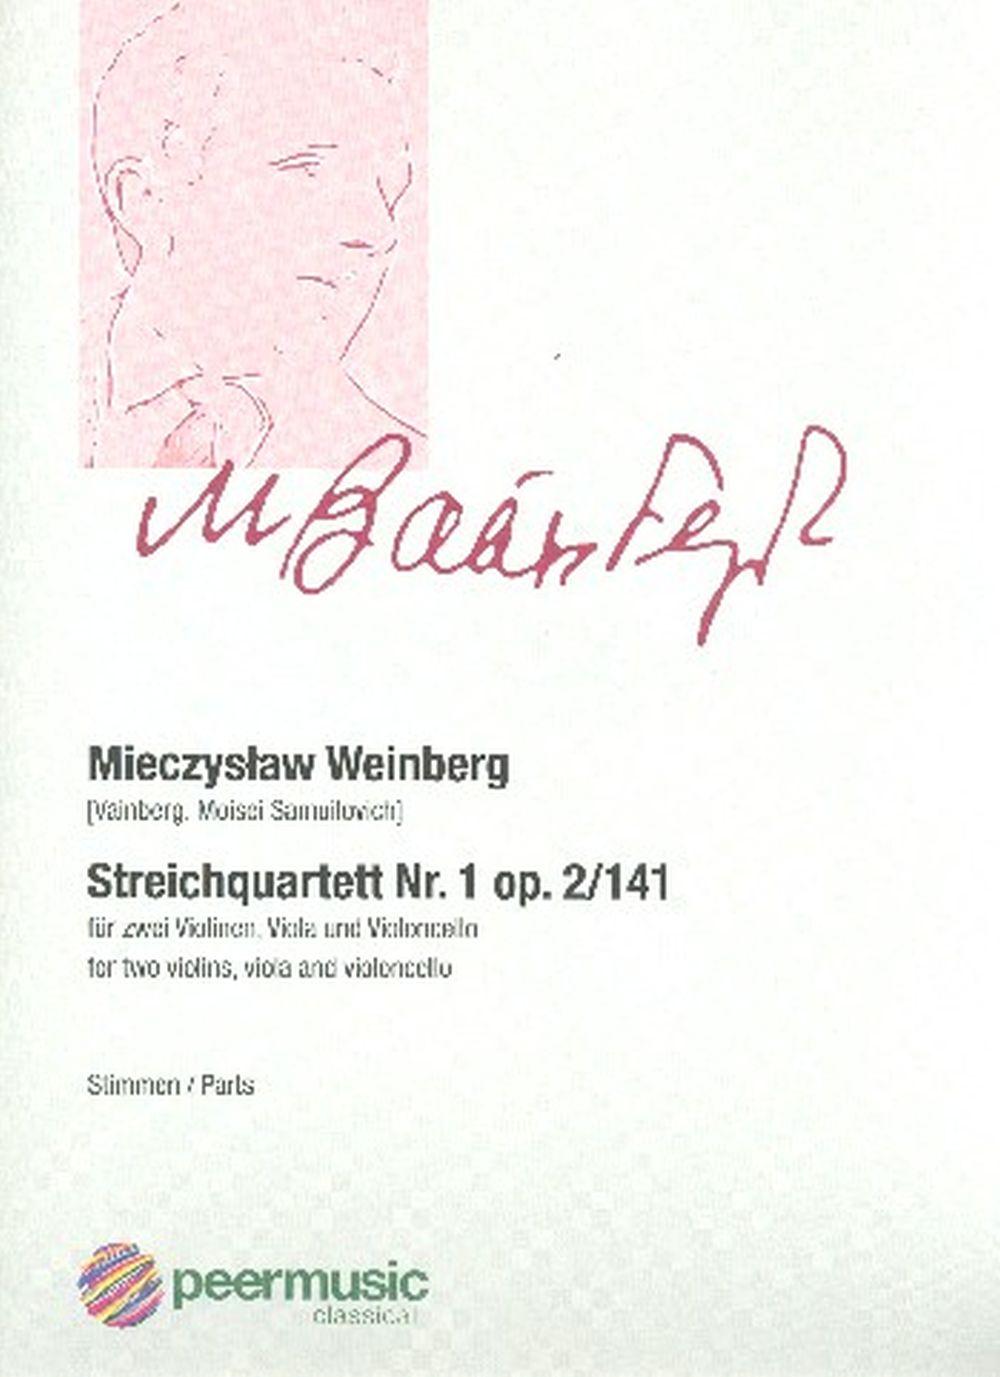 Mieczyslaw Weinberg: Streichquartett Nr 1 Opus 2/141: String Ensemble: Parts